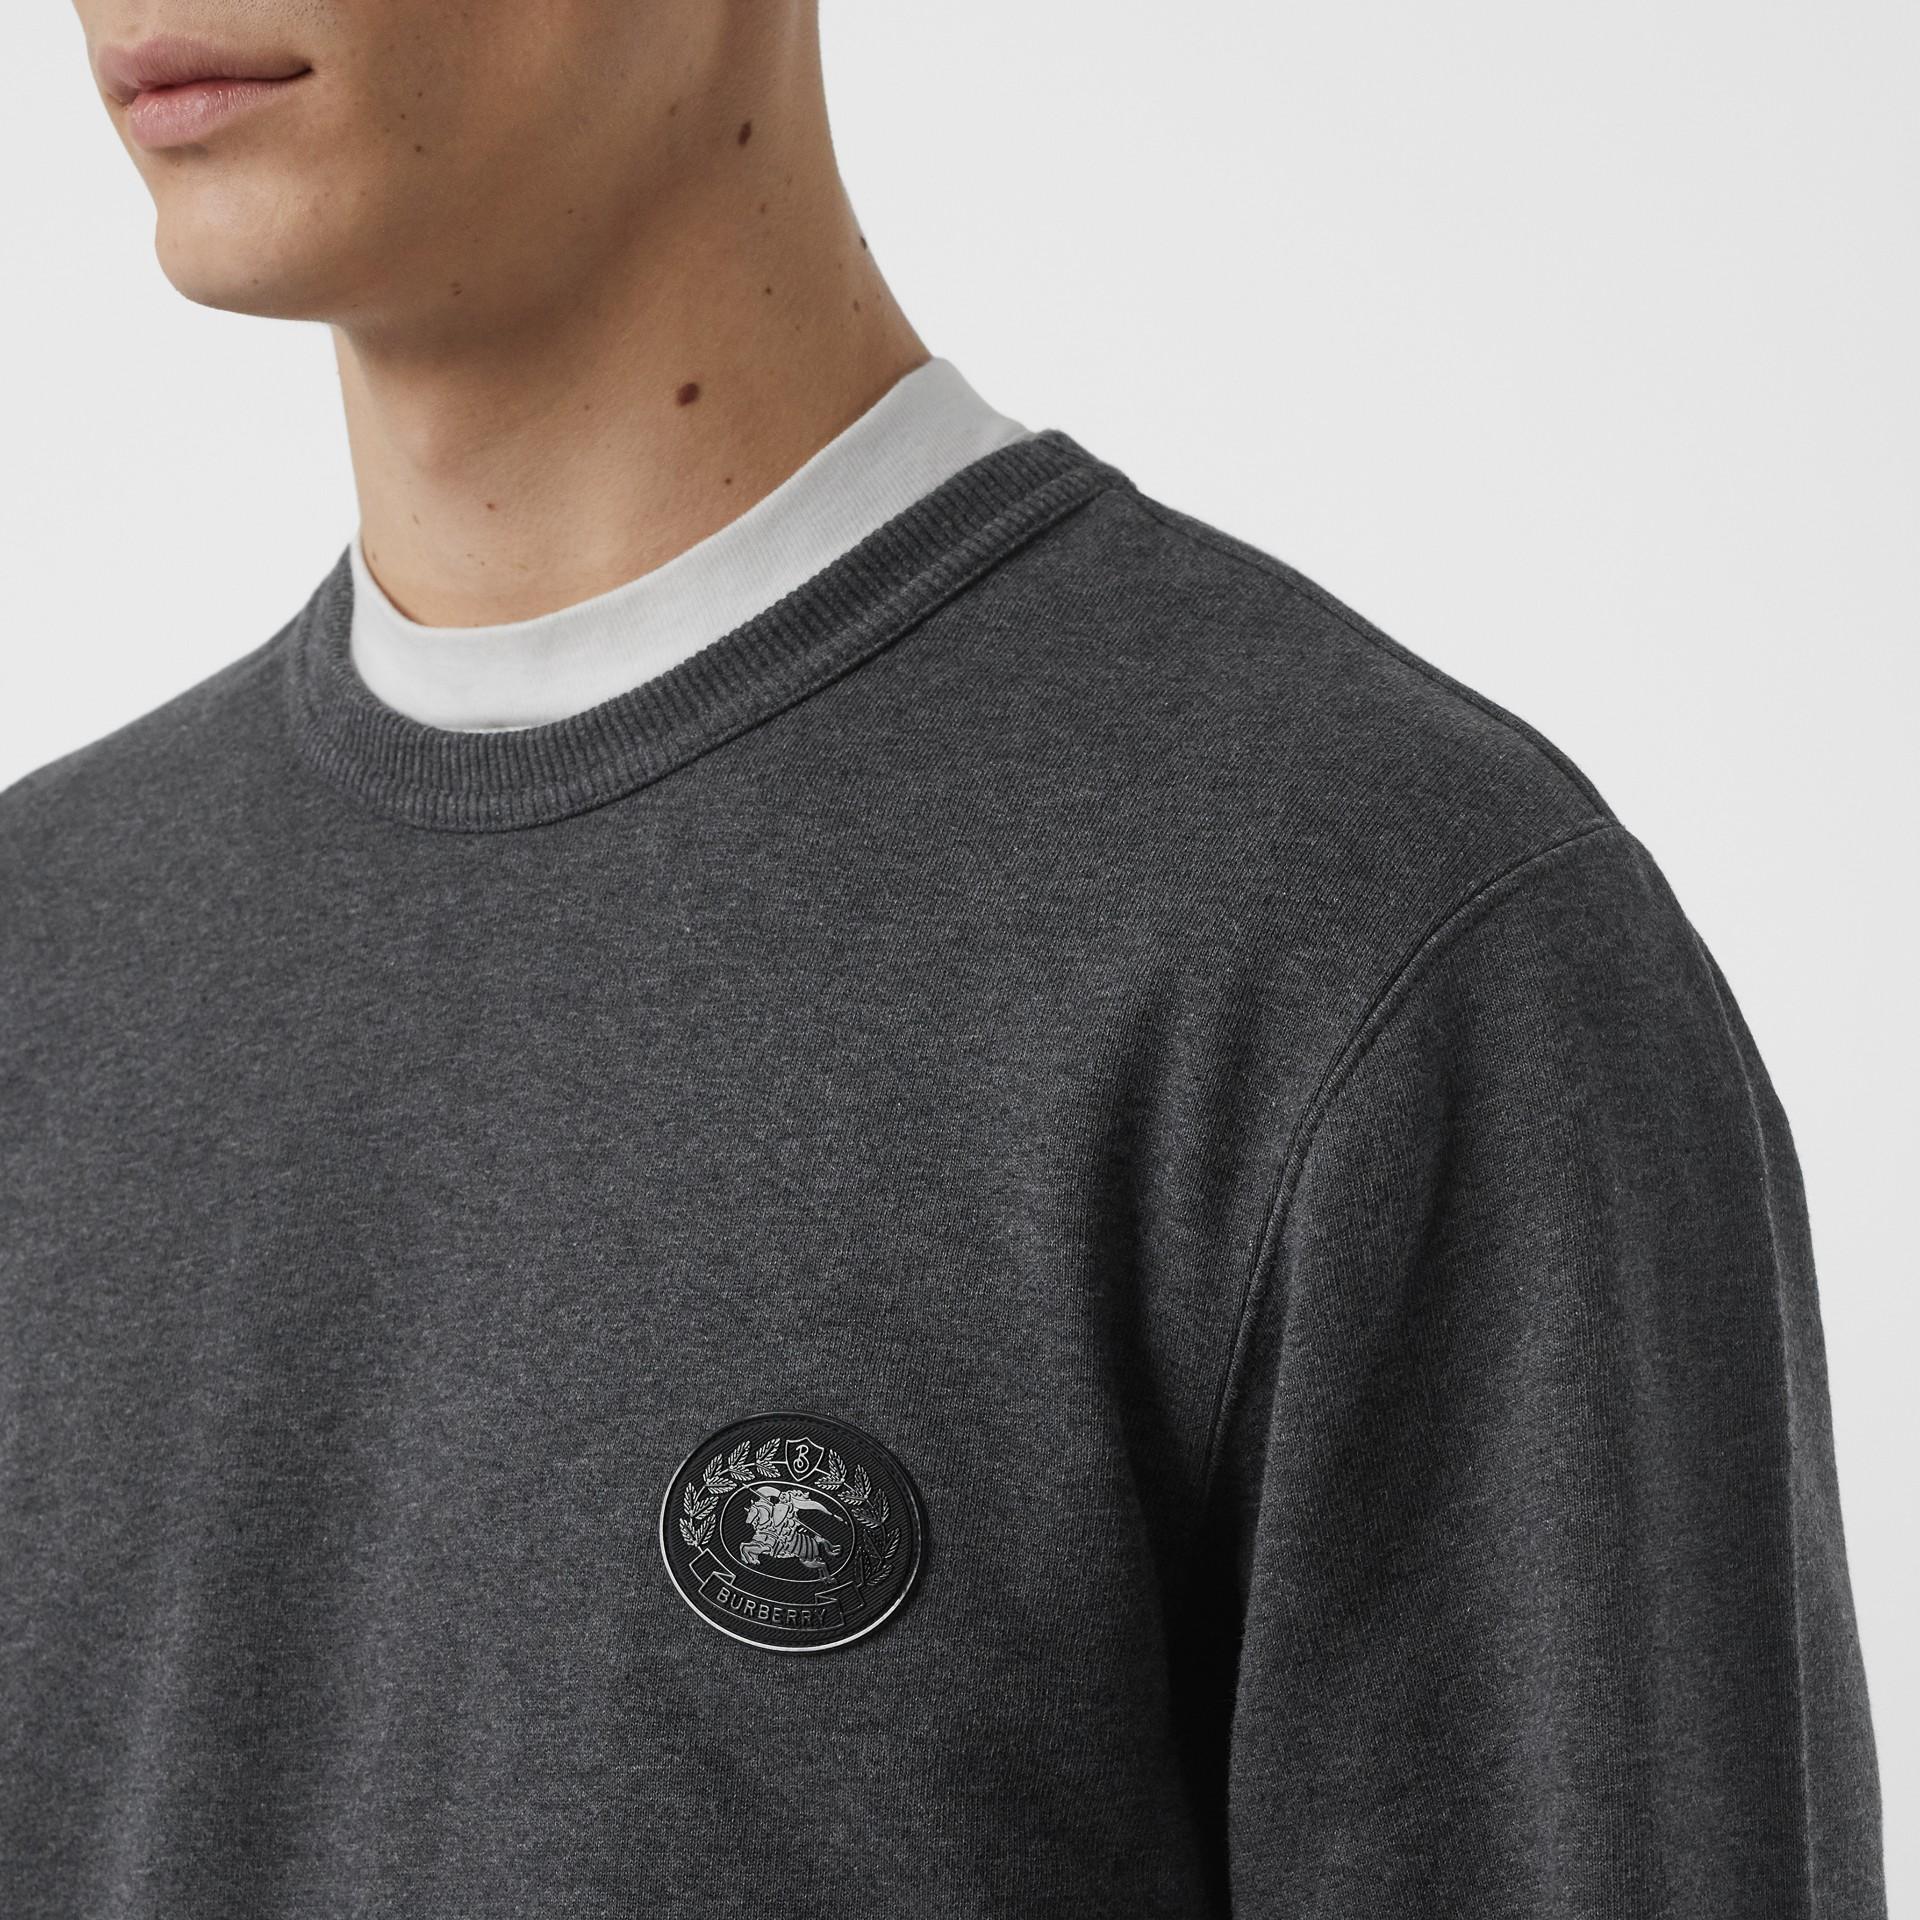 Embroidered Crest Cotton Sweatshirt in Mid Grey Melange - Men | Burberry United Kingdom - gallery image 1